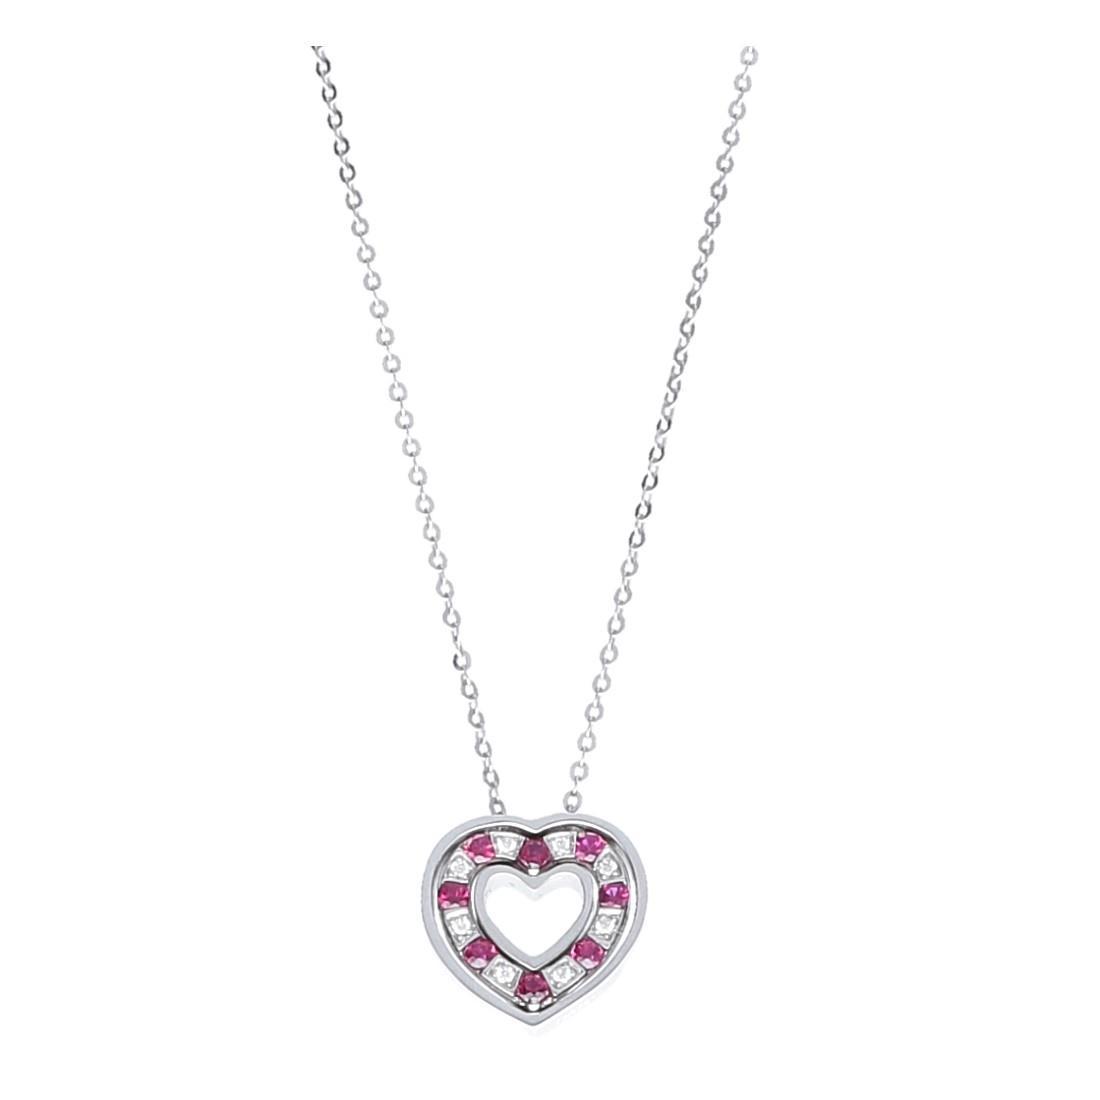 Collana in oro bianco con diamanti e rubini - DAMIANI